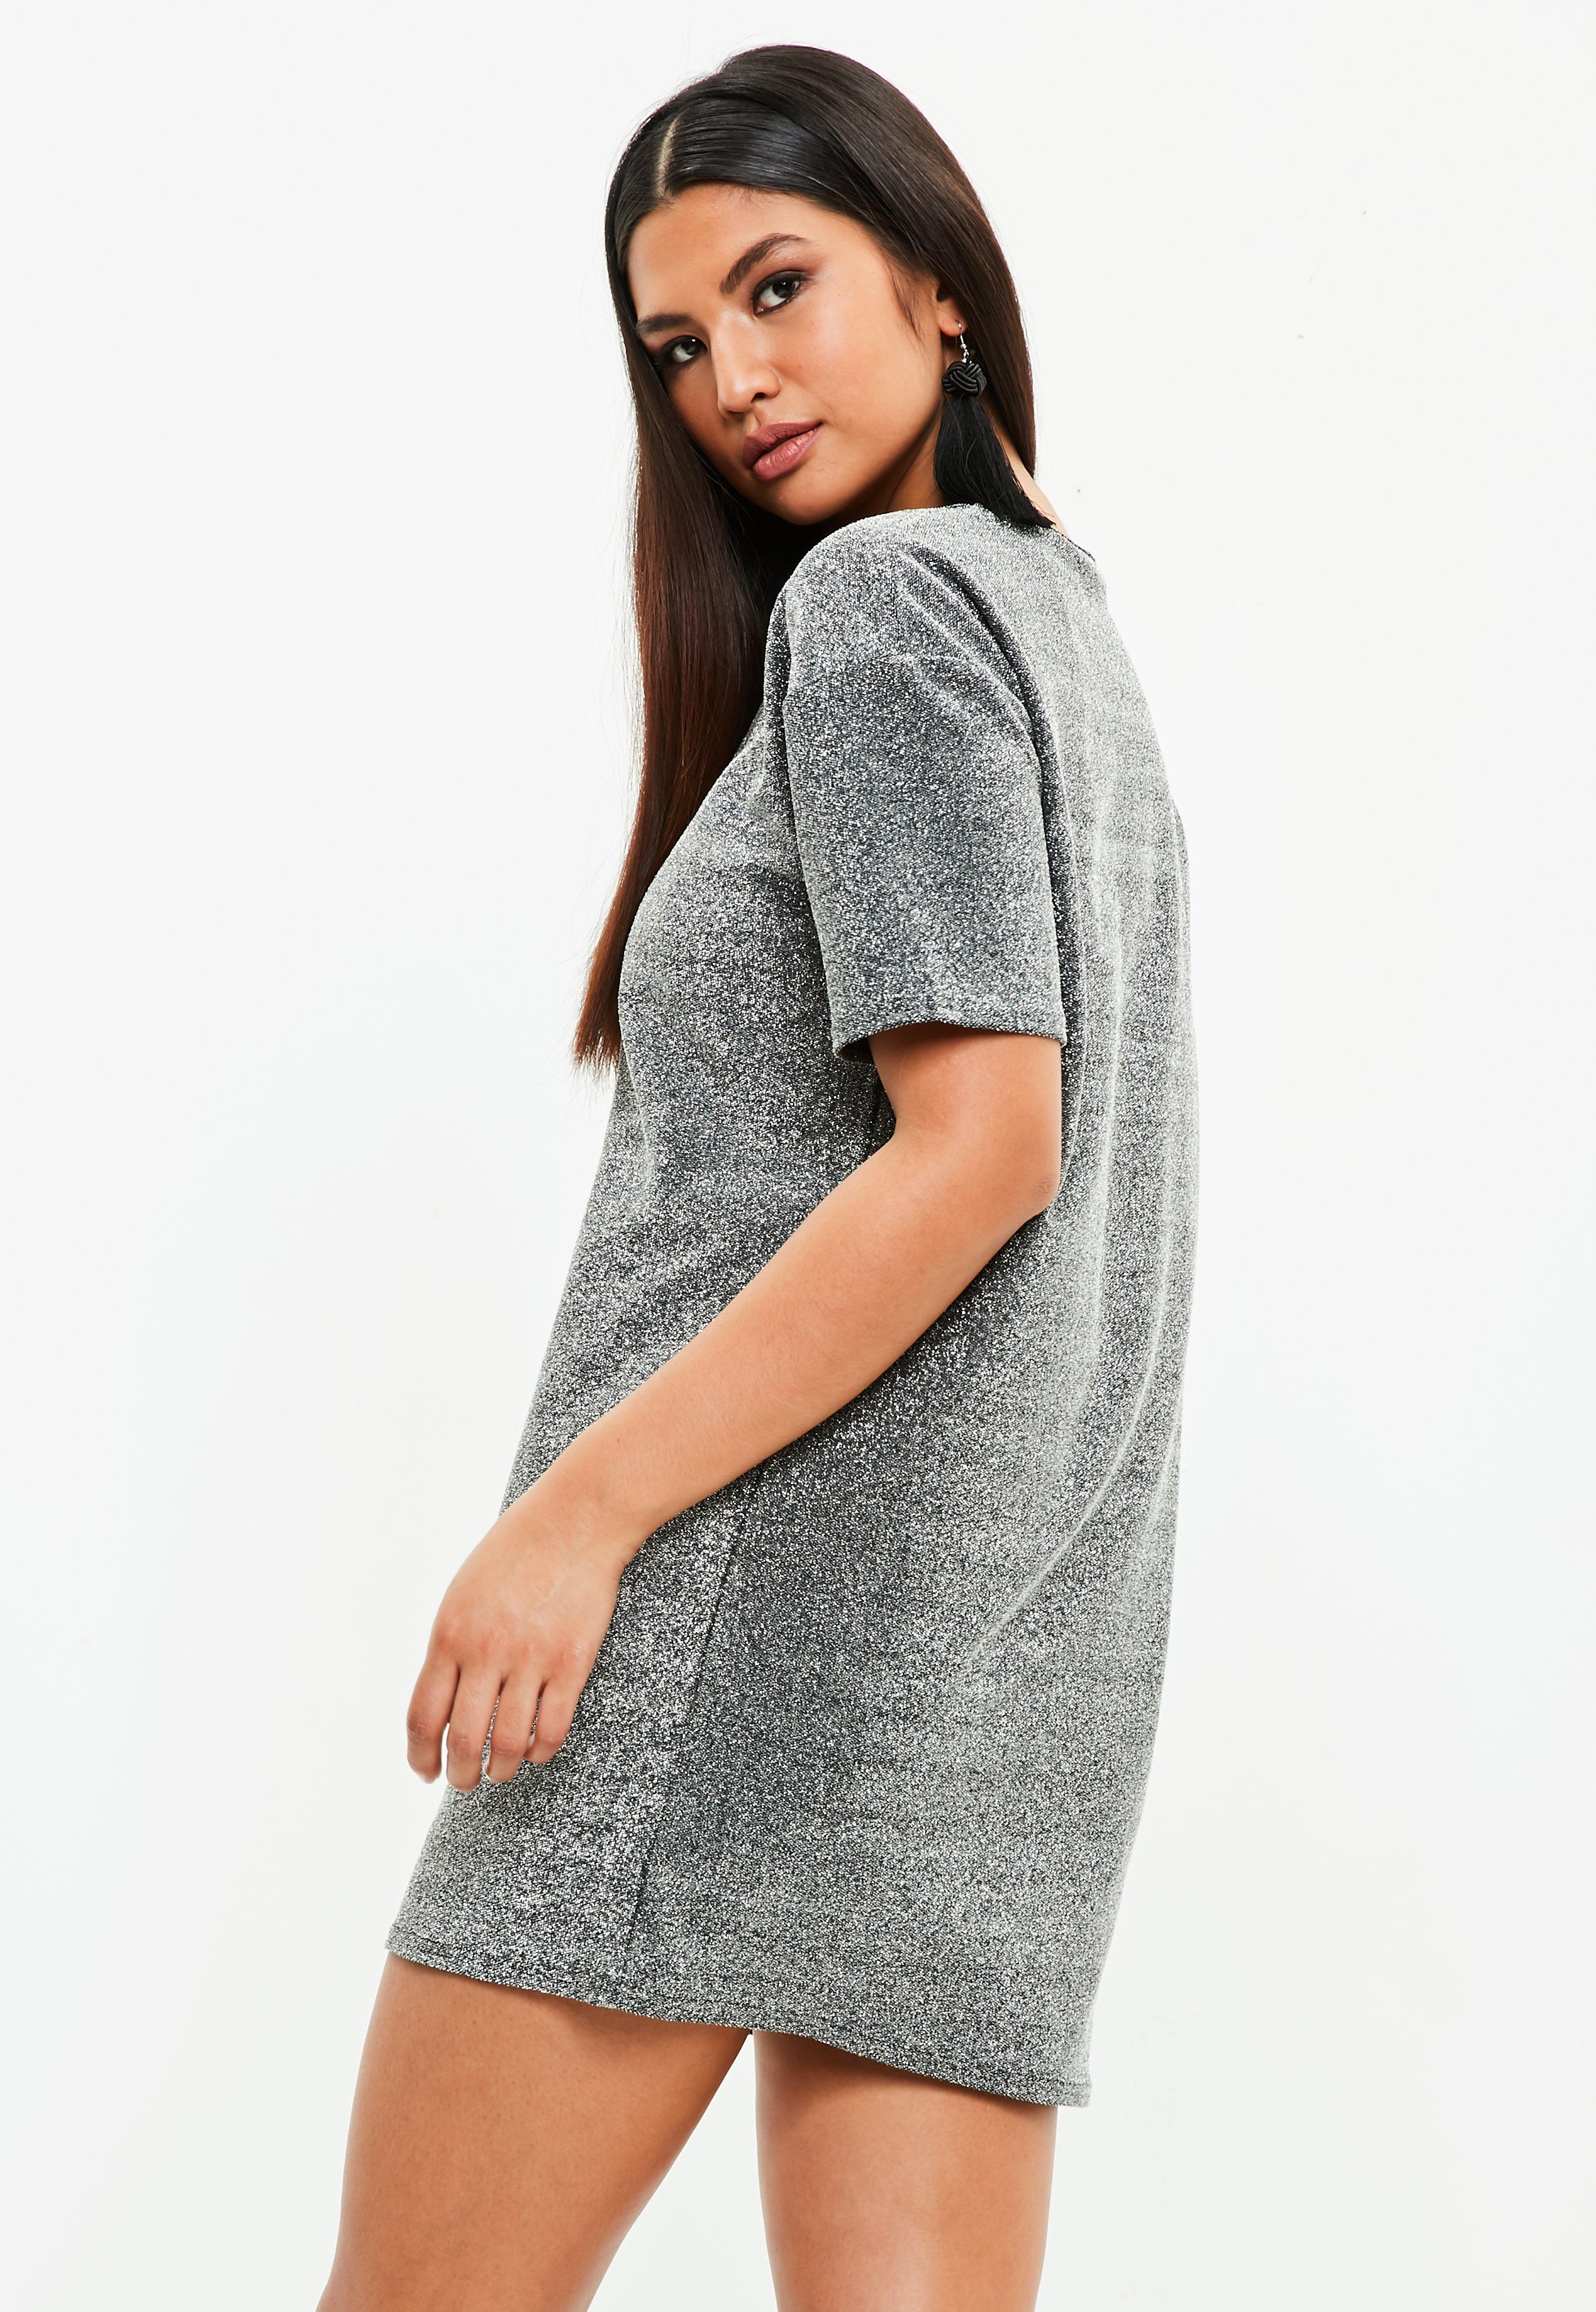 eb761d36234 Missguided Silver Glitter Oversized T-shirt Dress in Metallic - Lyst